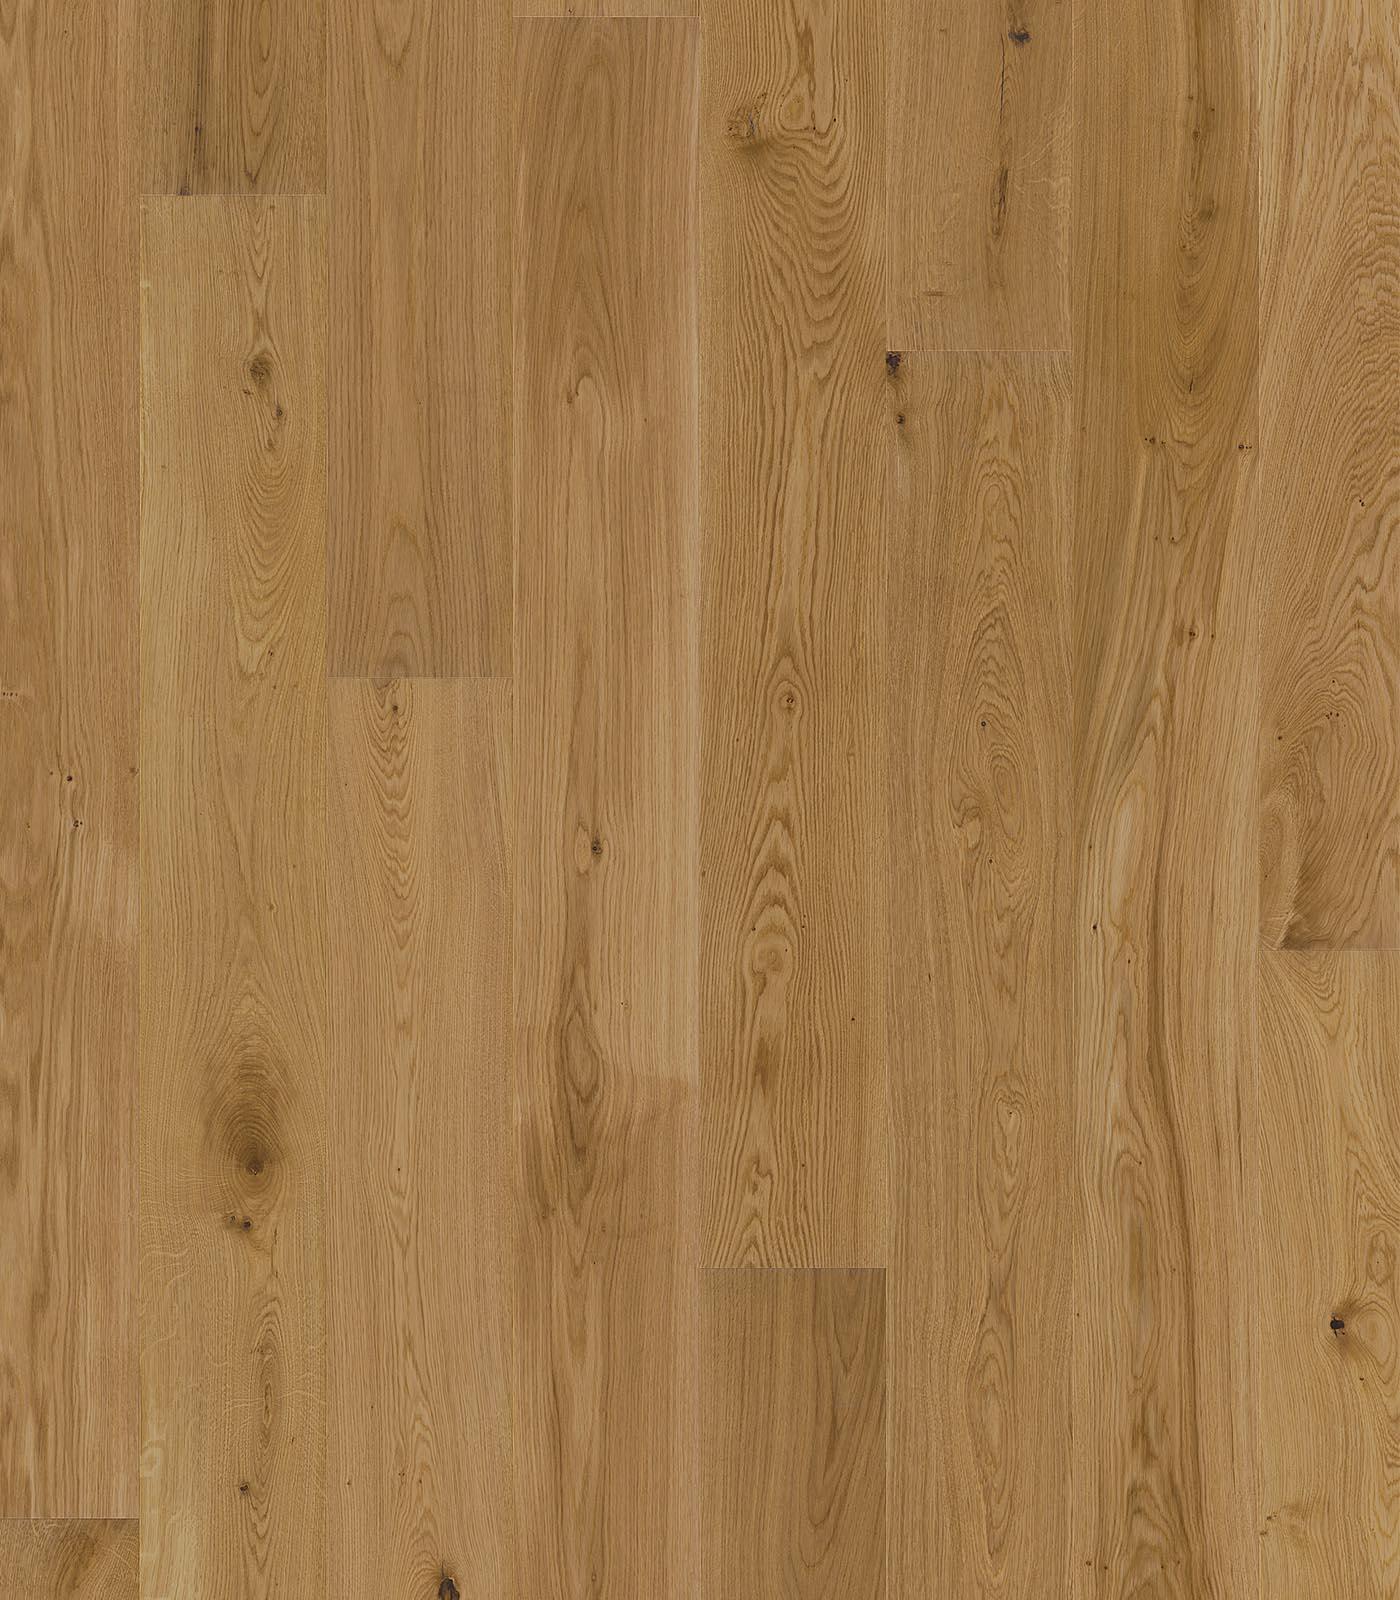 European-Oak-rustic-floors-Origins-Collection-flat